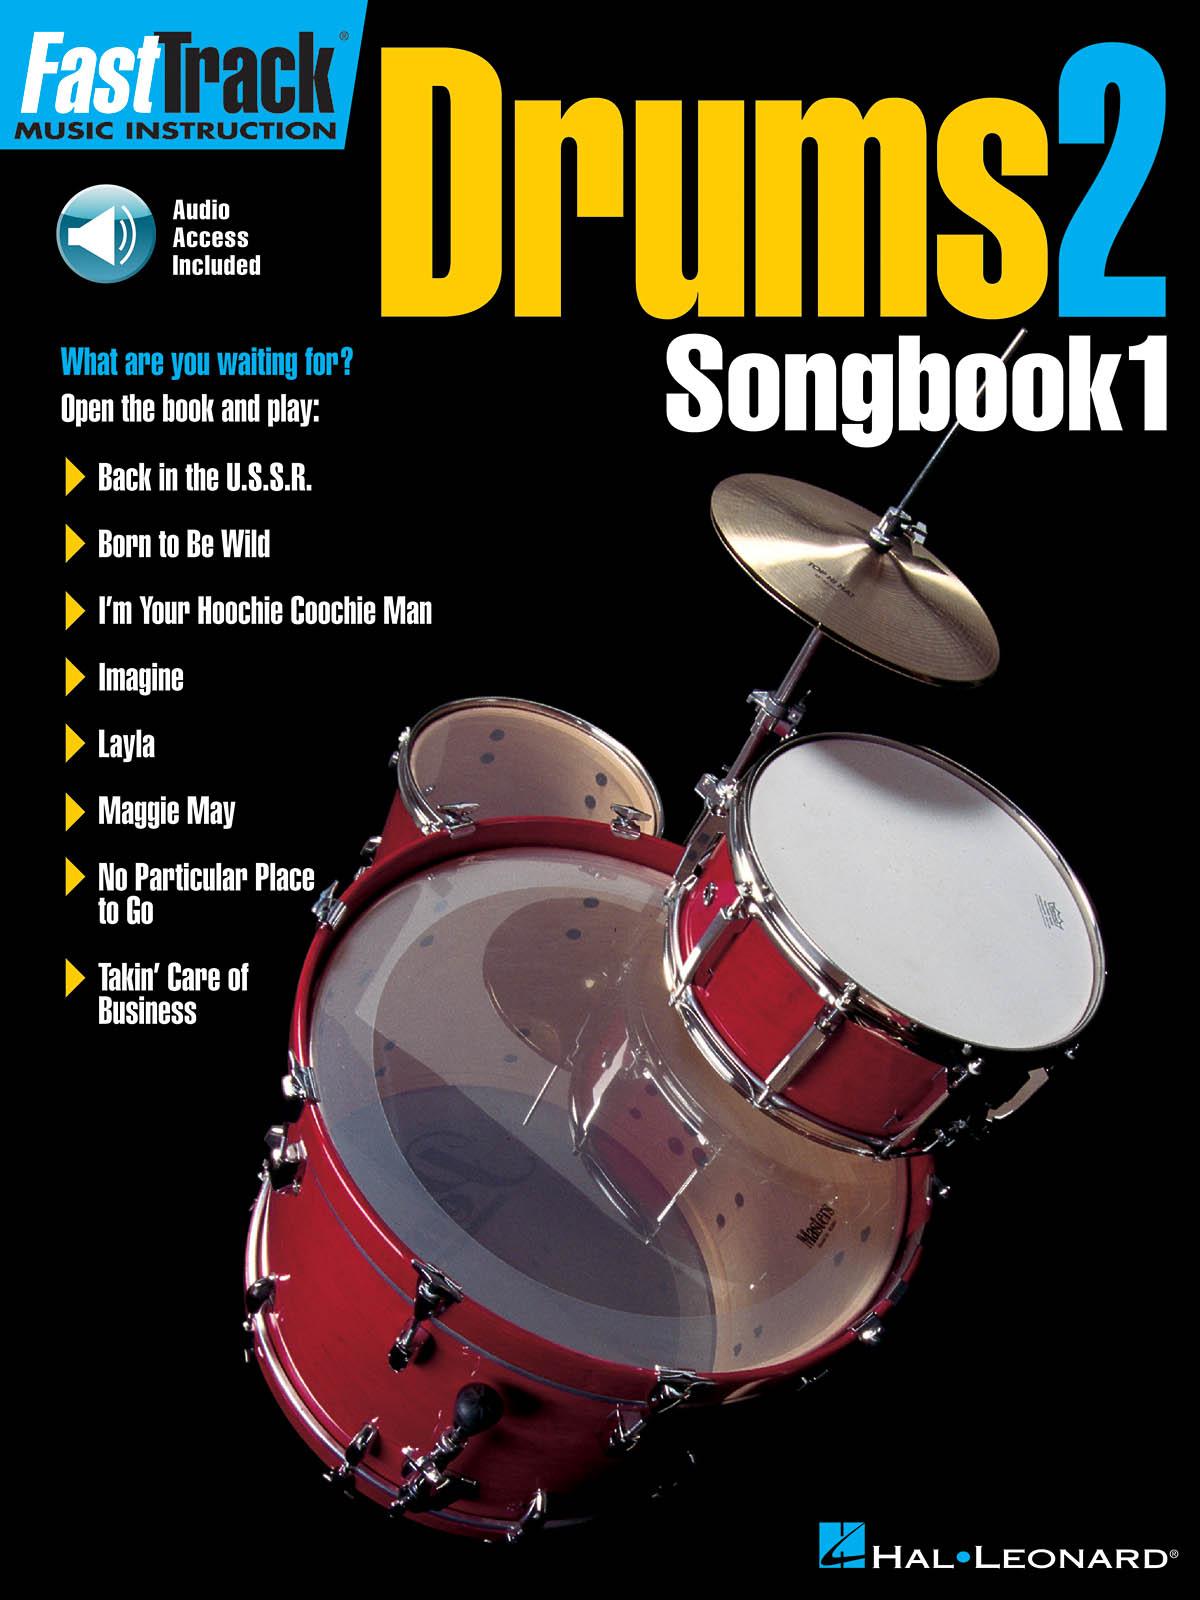 FastTrack - Drums 2 - Songbook 1: Drum Kit: Mixed Songbook